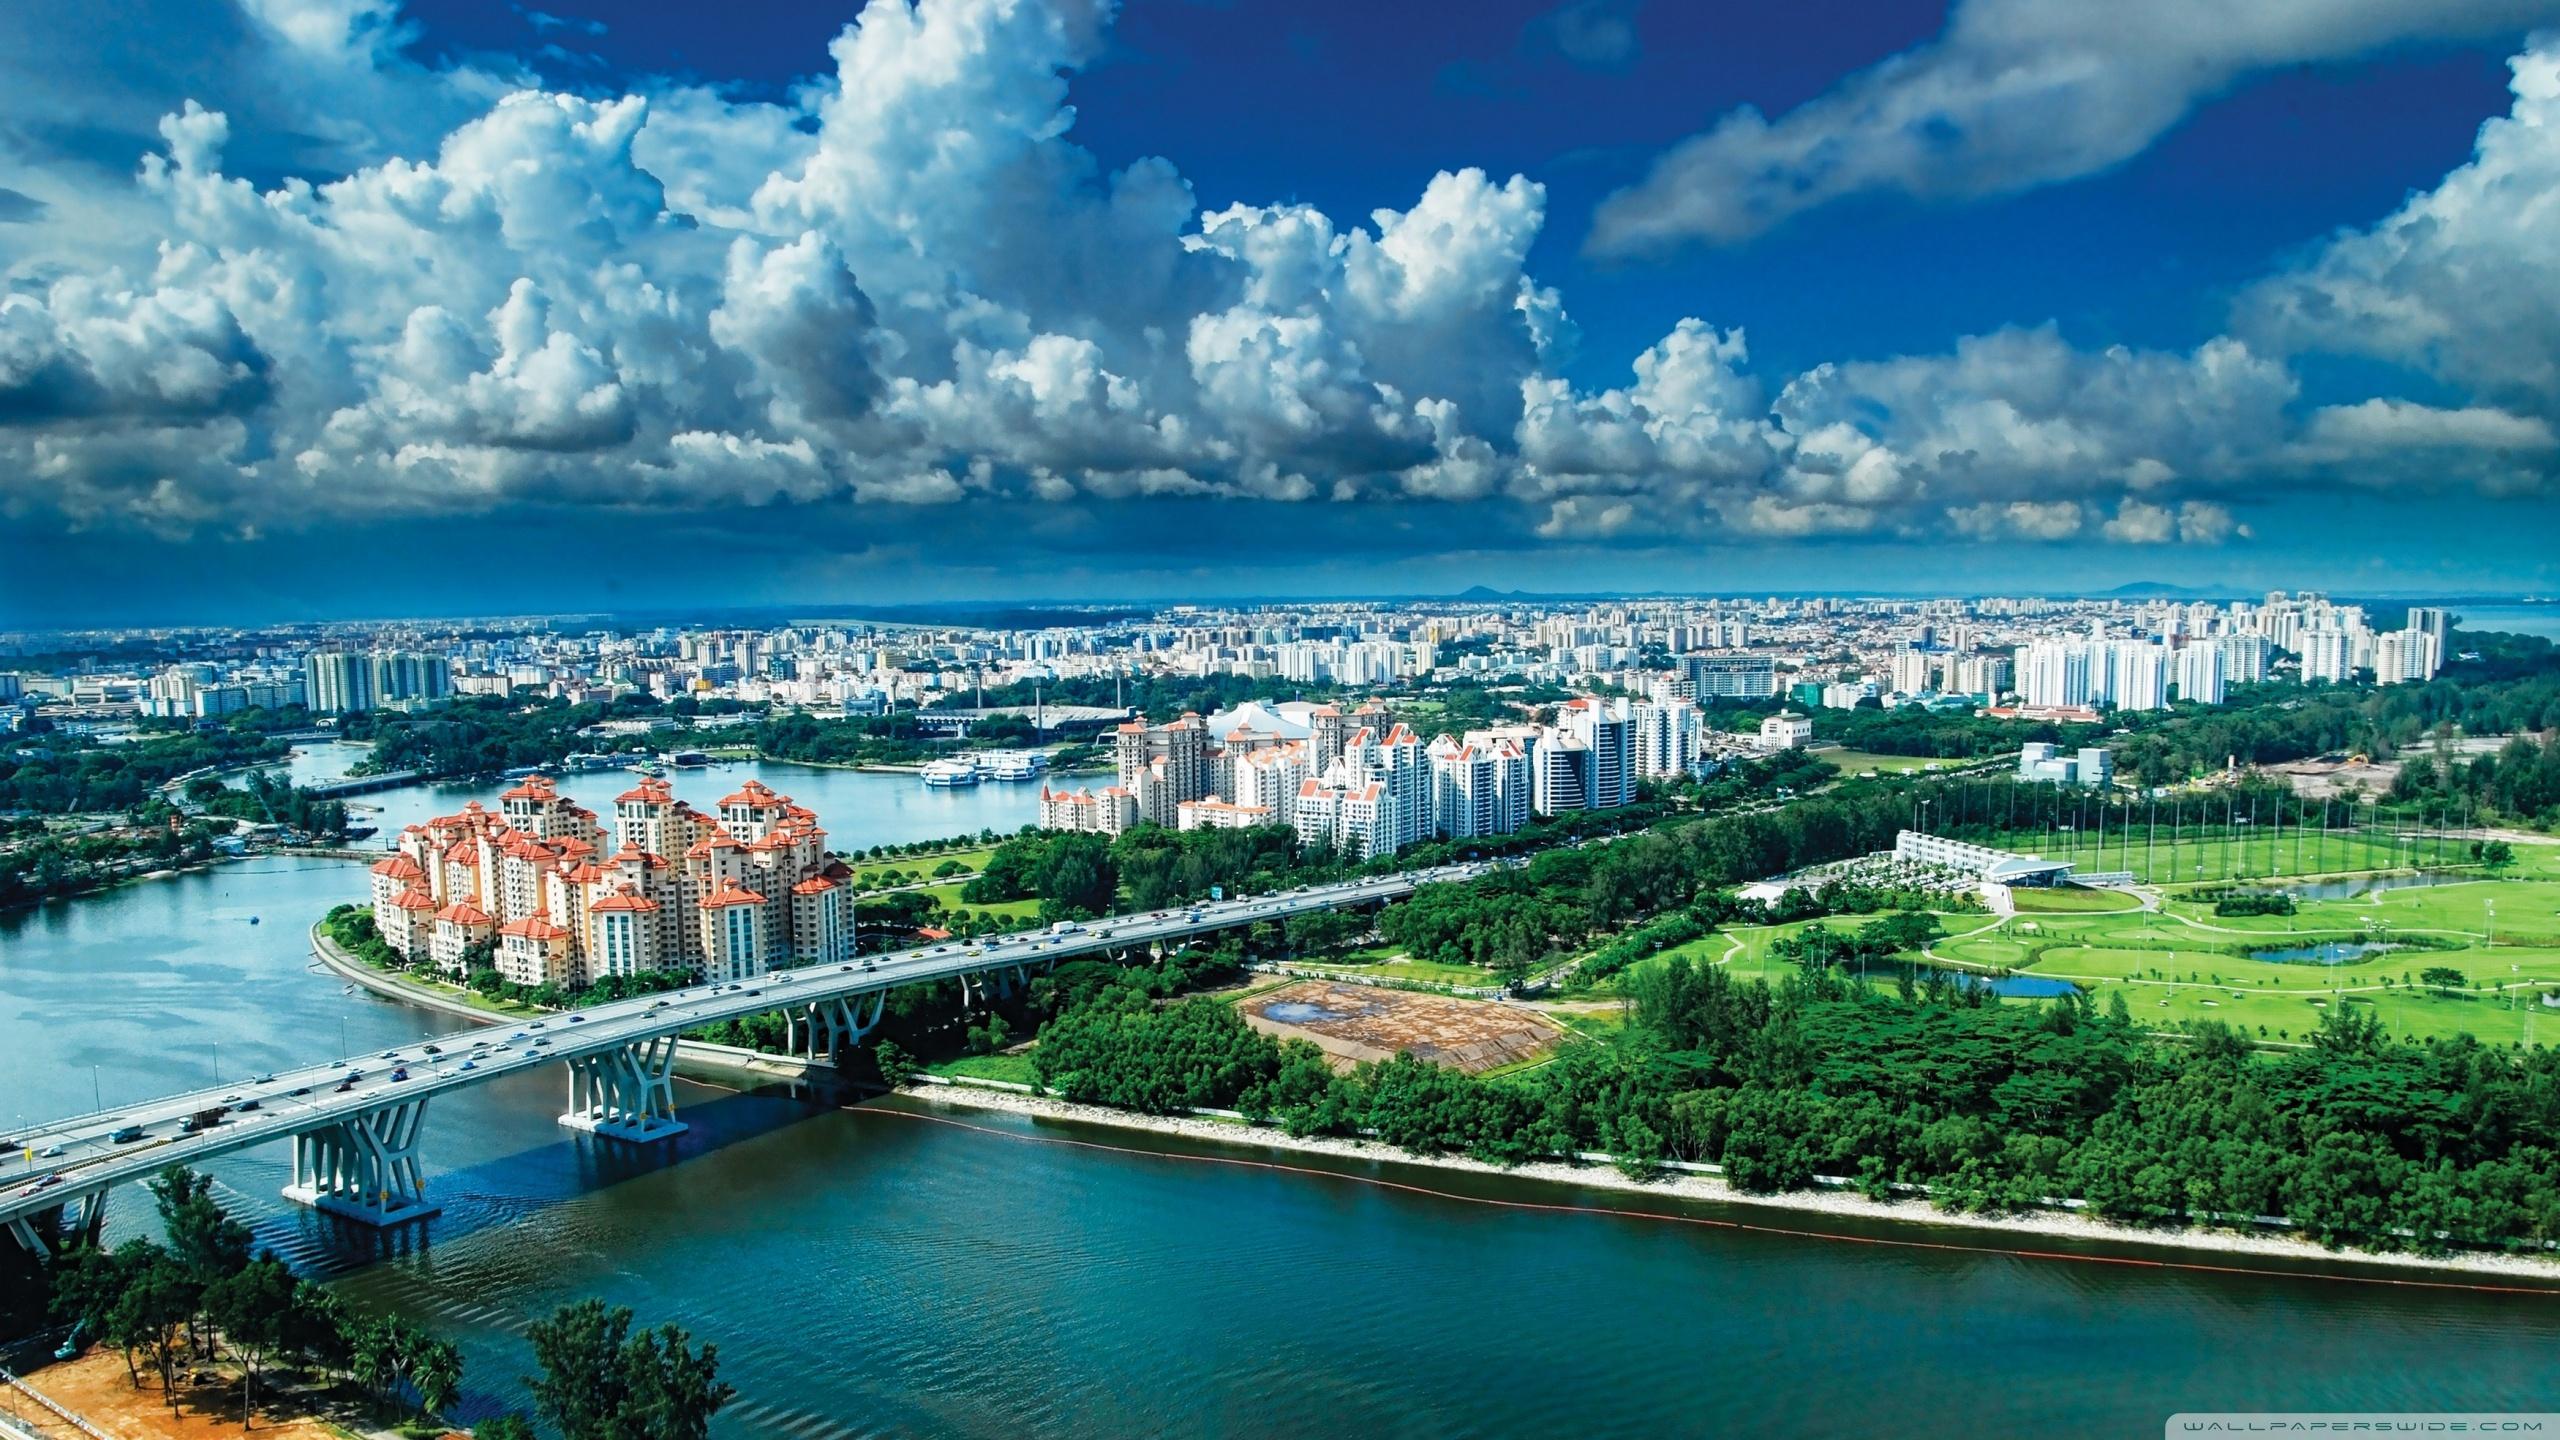 Singapore New Condominium Berkeley Residences Telok Kurau The 2560x1440